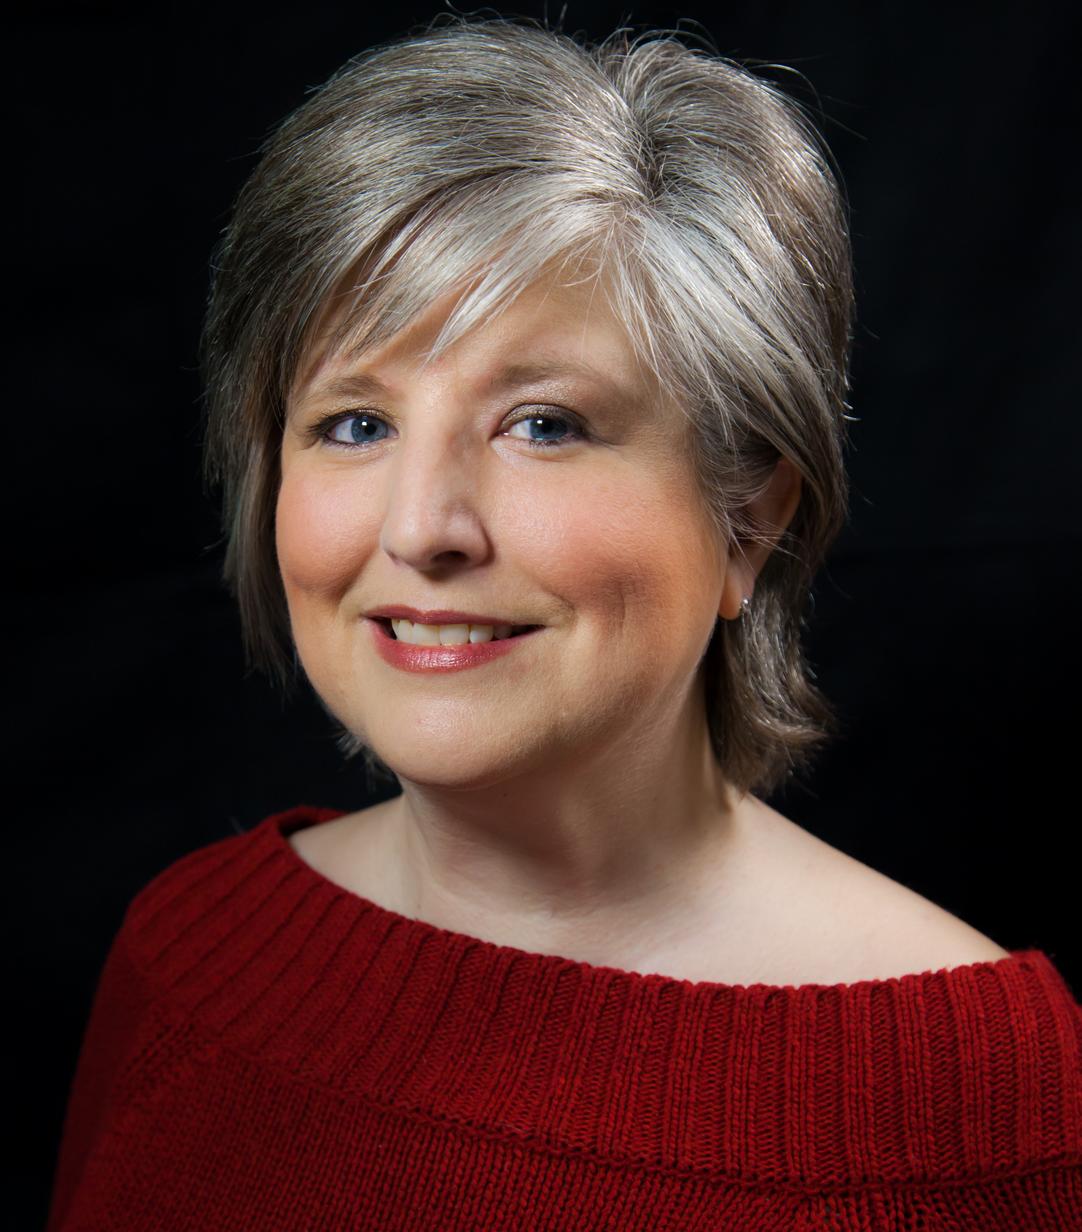 Catherine Joell MacKinnon